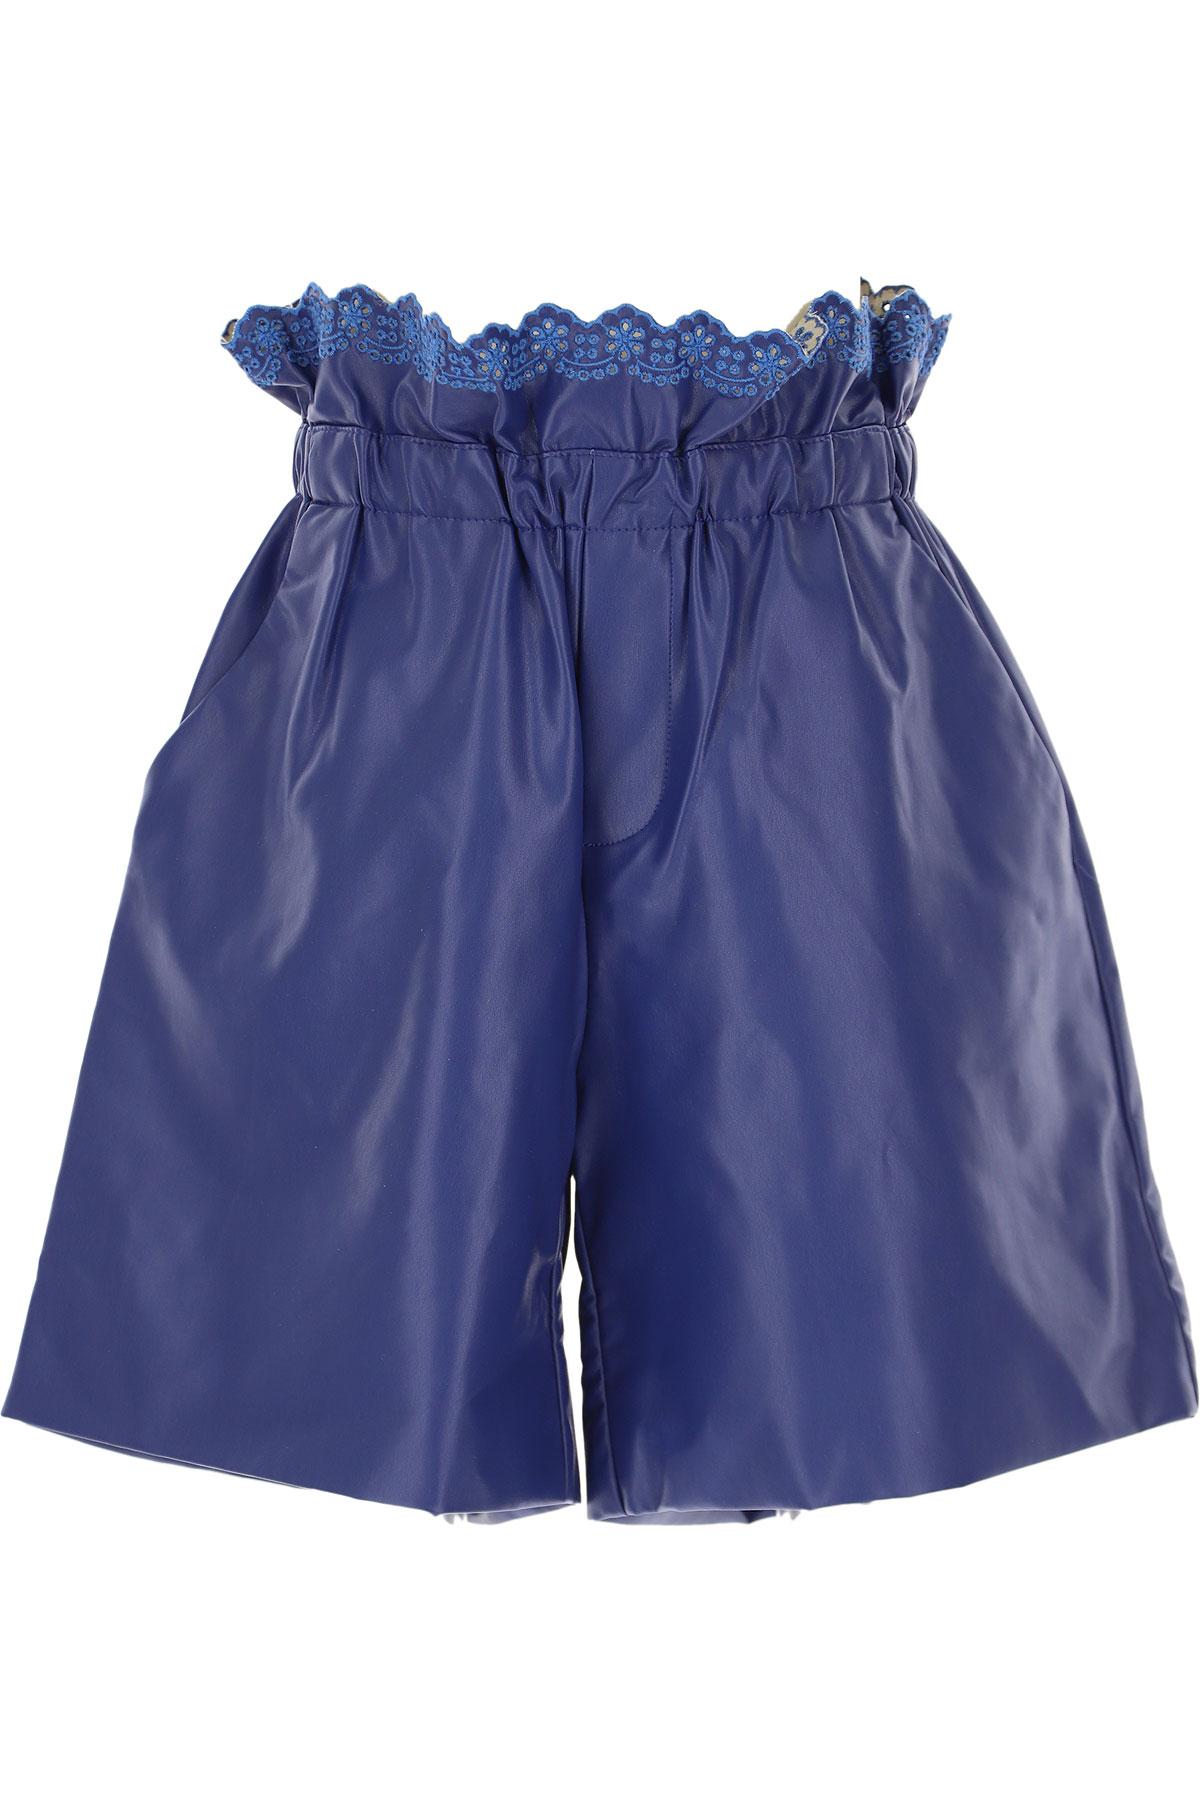 Philosophy di Lorenzo Serafini Kids Shorts for Girls On Sale, Royal Blue, polyurethane, 2019, M XL XS